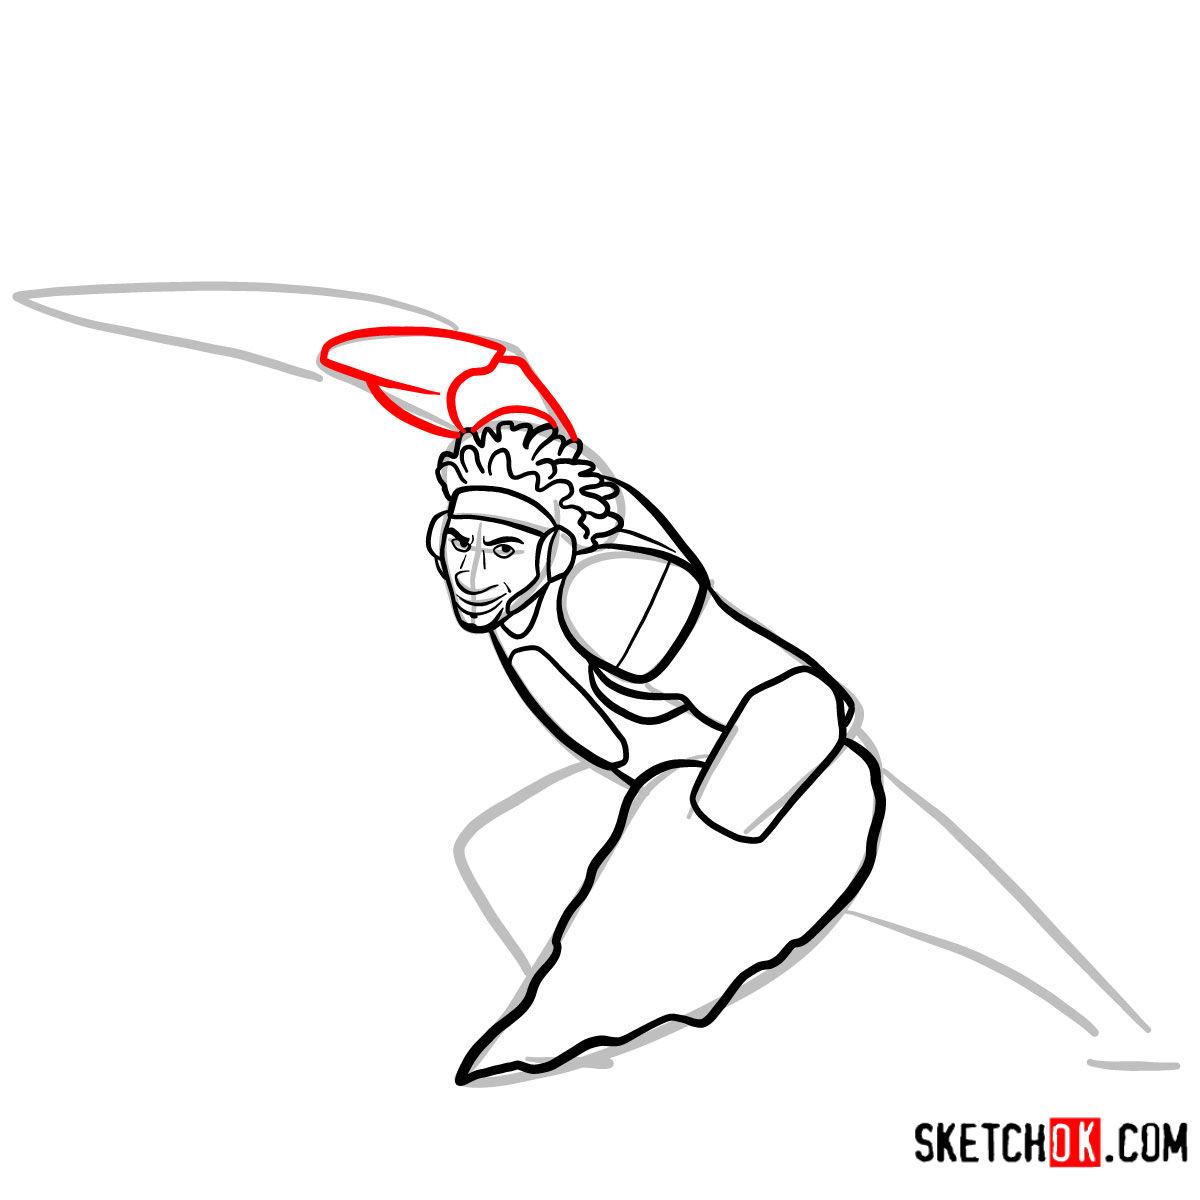 How to draw Wasabi as a superhero | Big Hero 6 - step 08